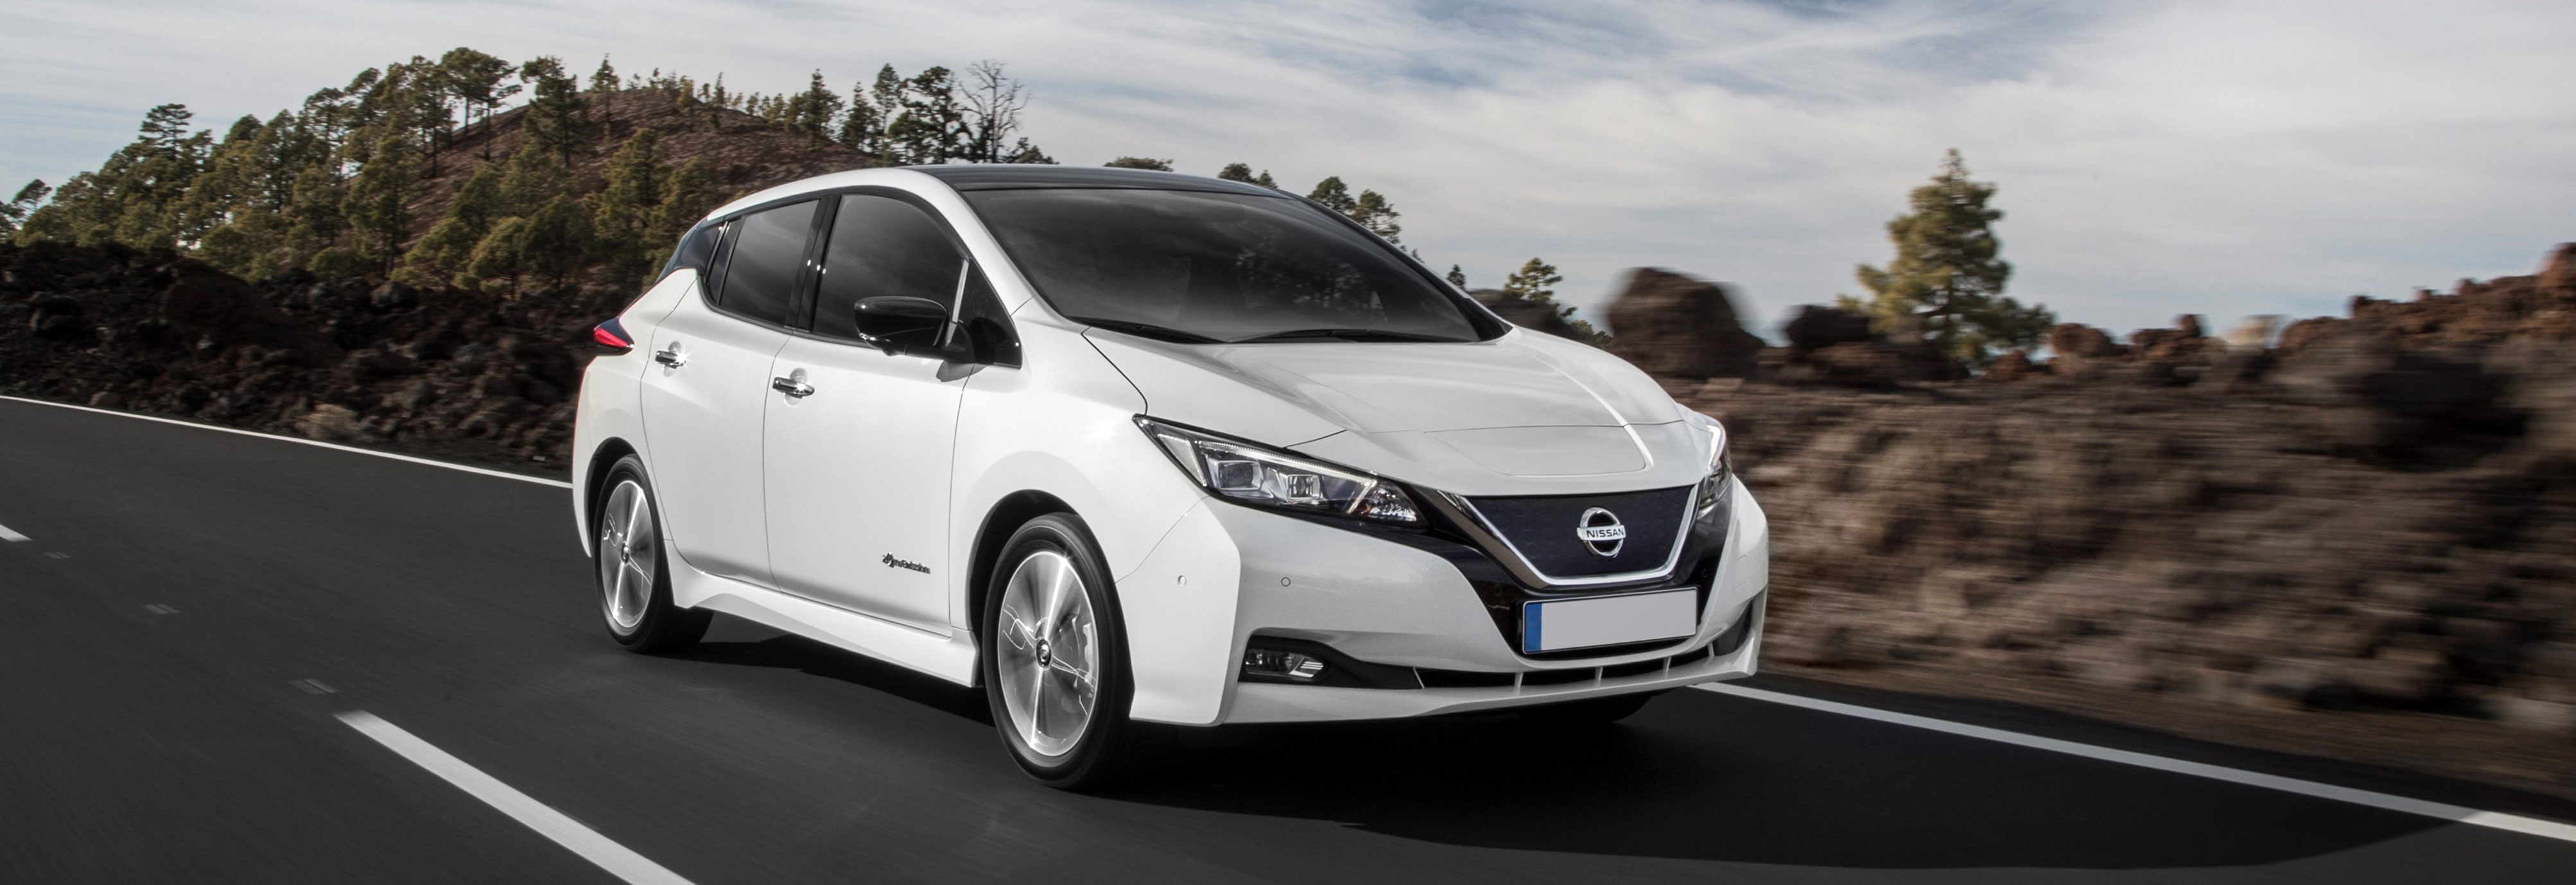 electric car motor for sale. 2018 Nissan Leaf White Driving Front Electric Car Motor For Sale